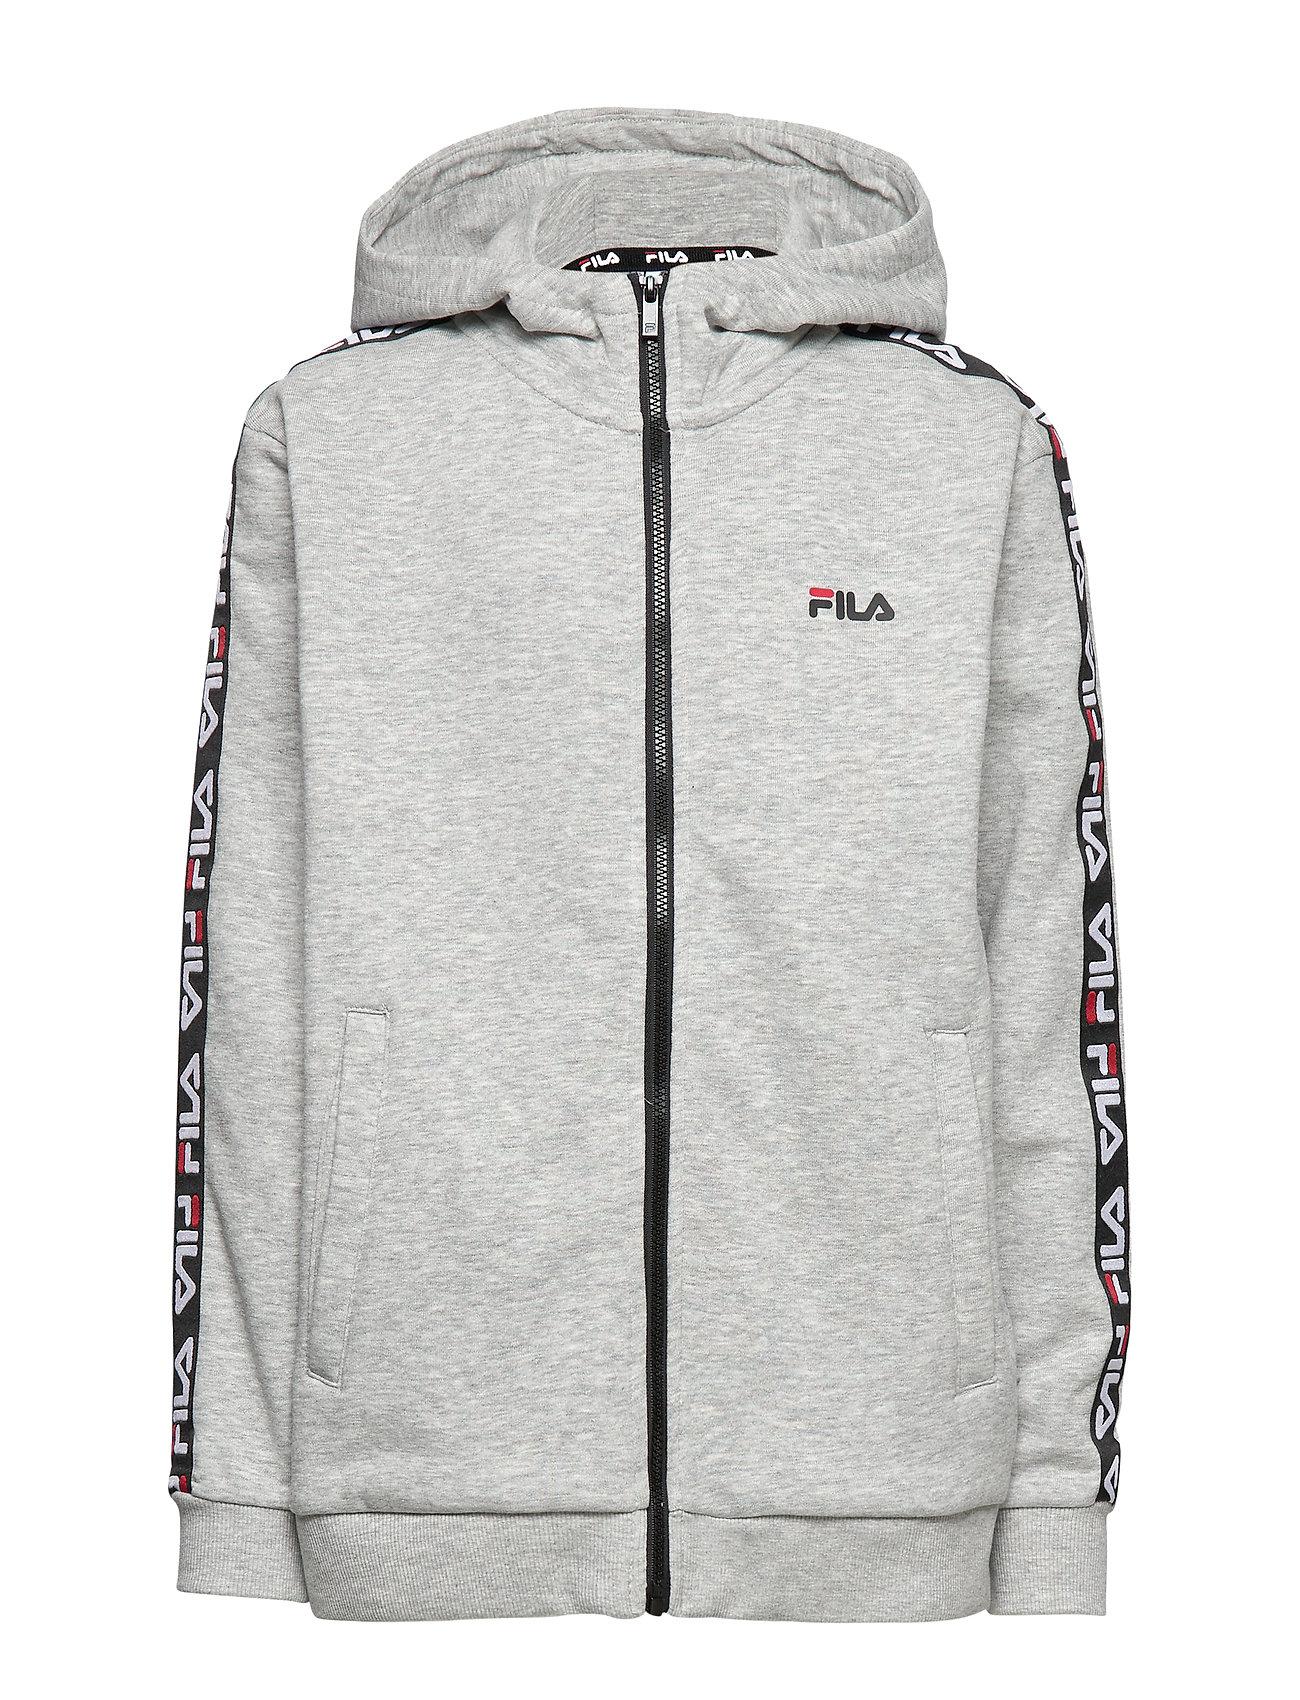 FILA KIDS ADARA zip jacket - IGHT GREY MELANGE BROS